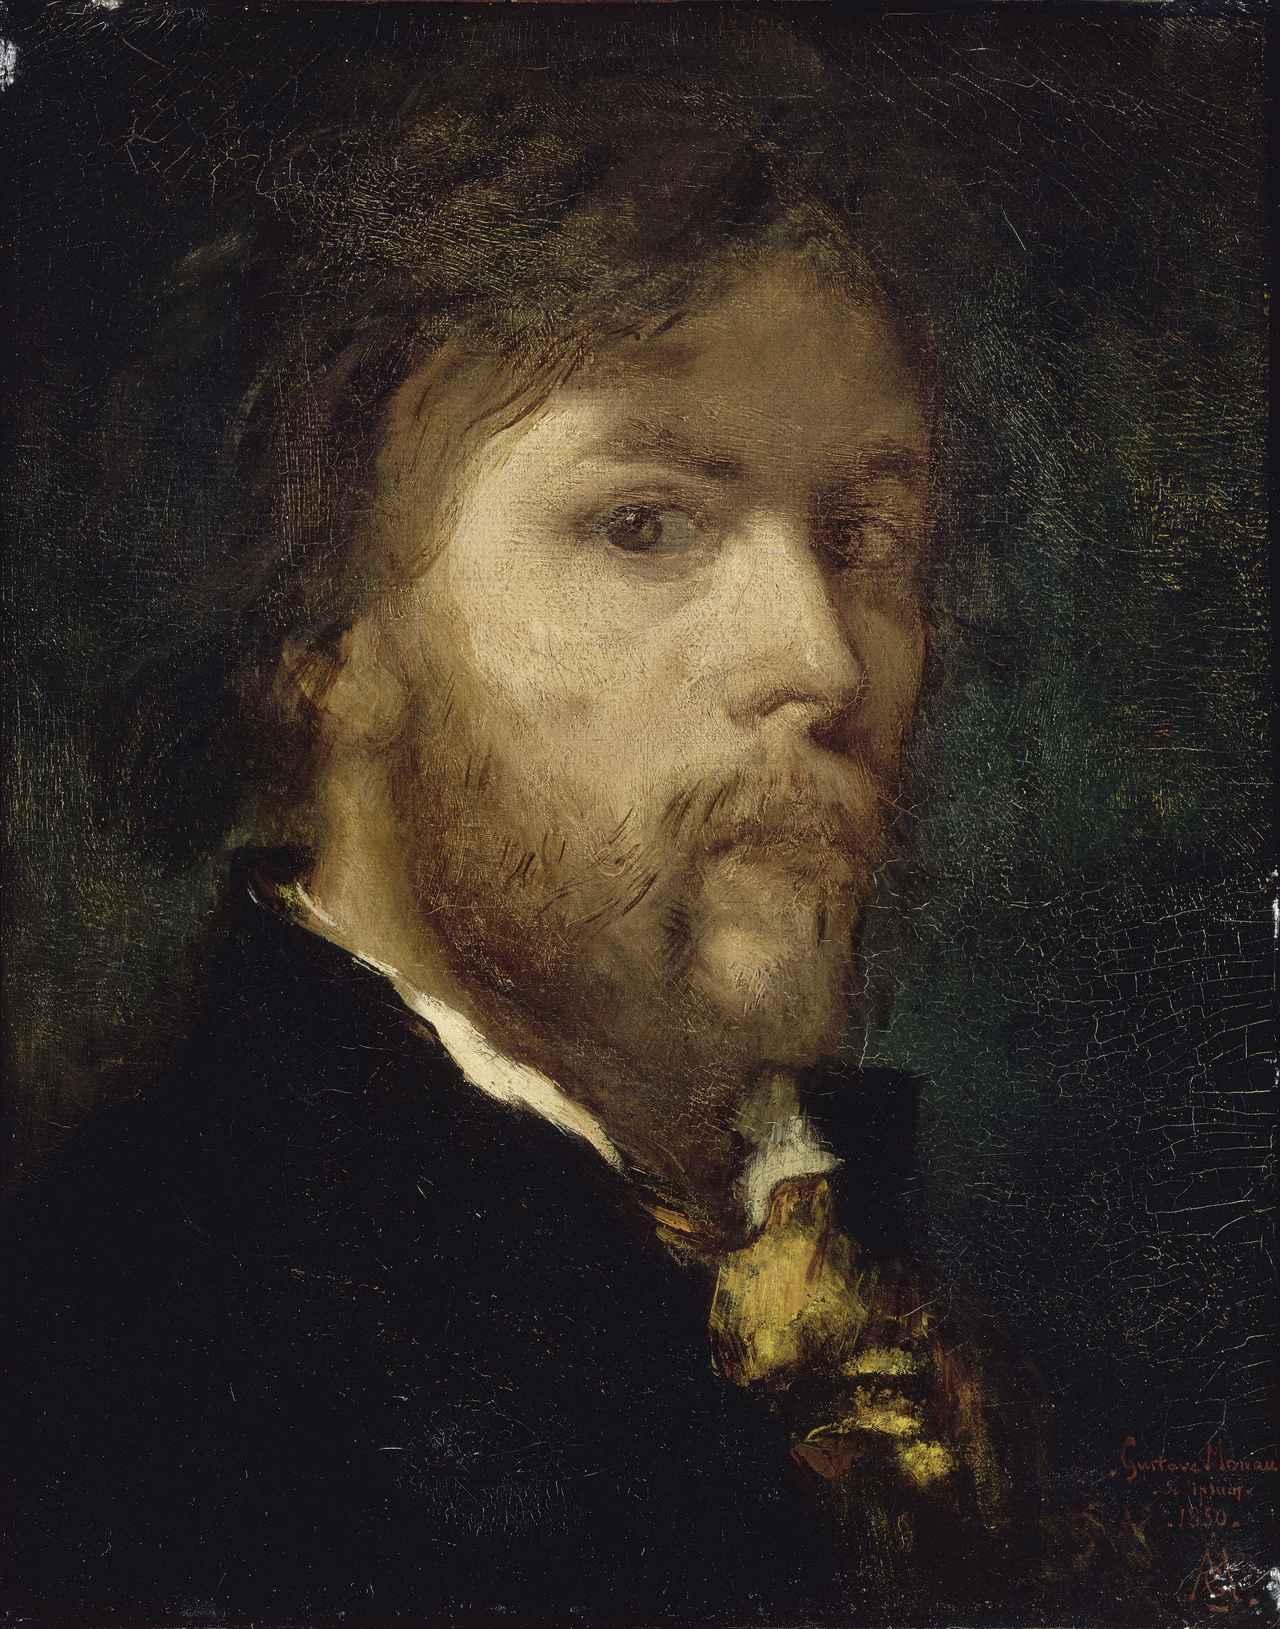 画像: 《24歳の自画像》1850年 油彩/カンバス 41×32cm Photo © RMN-Grand Palais / René-Gabriel Ojéda / distributed by AMF